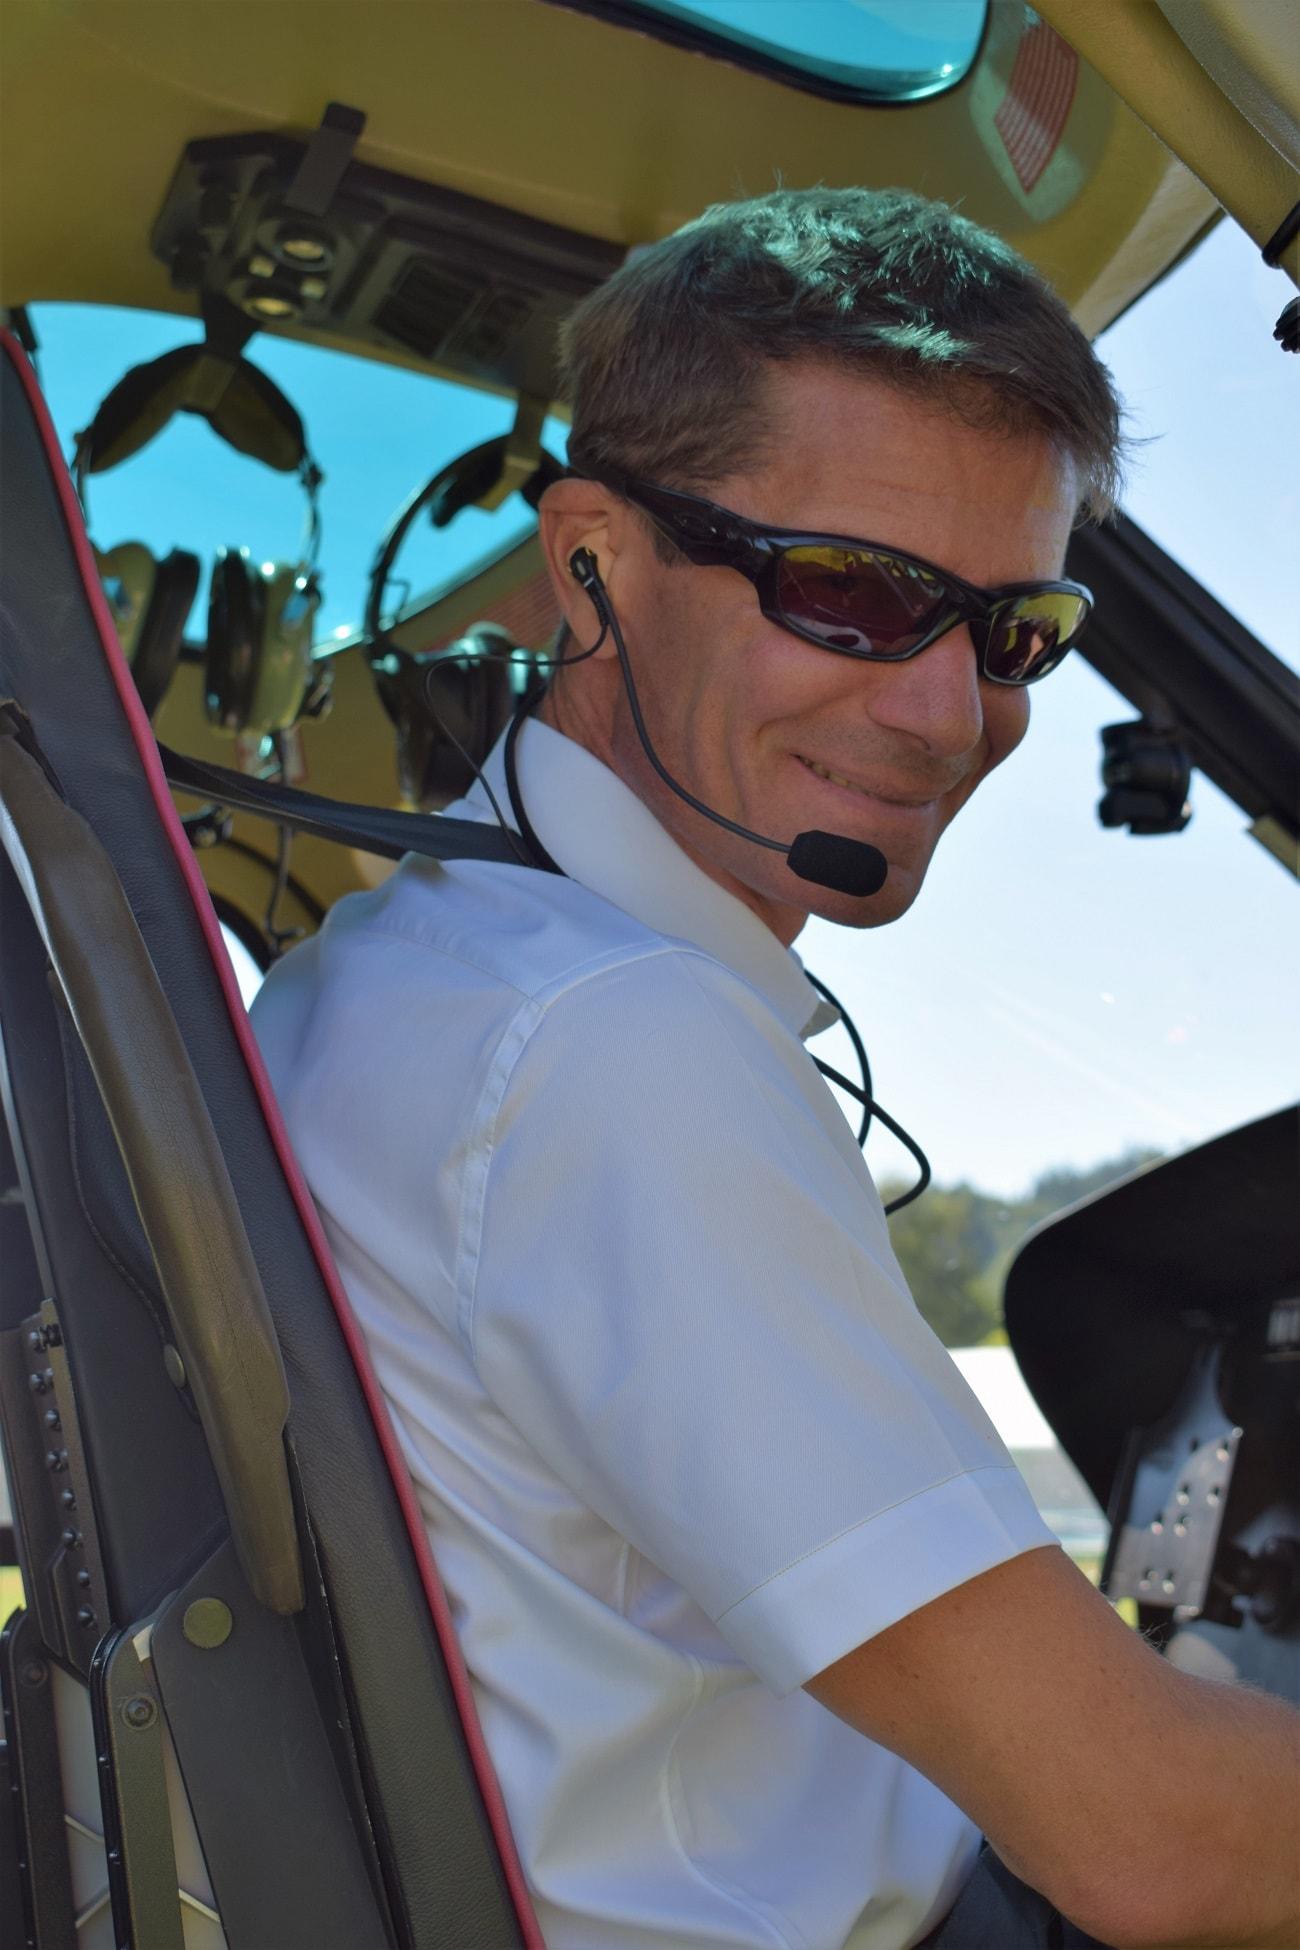 AS 350, HB-ZPF, Rundflugtage Rohrbach stellt aus, Pilot Daniel Spörli